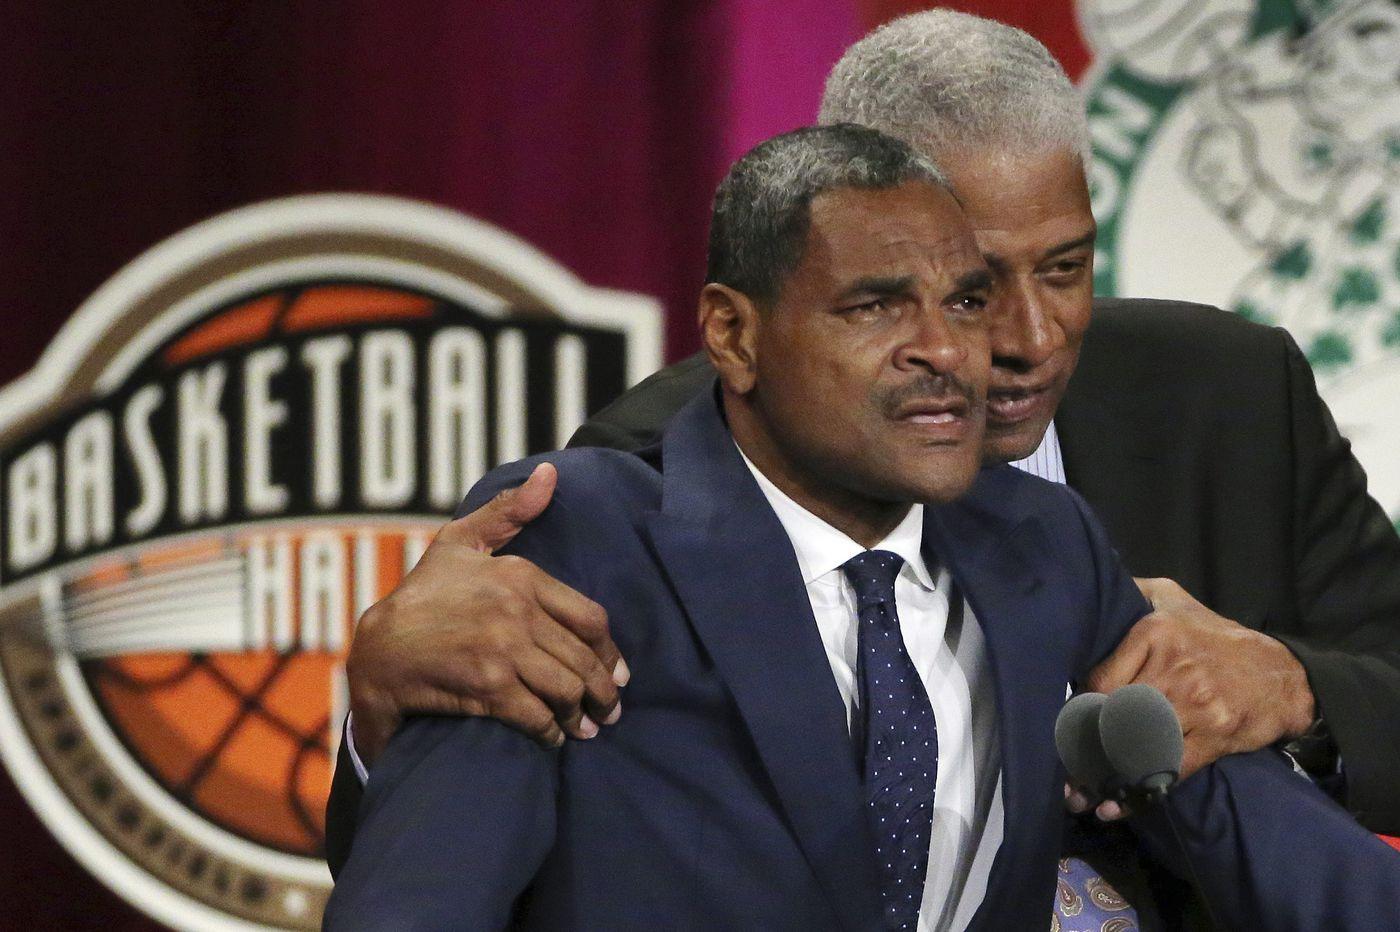 Former 76ers star Maurice Cheeks makes tearful entry to basketball hall of fame